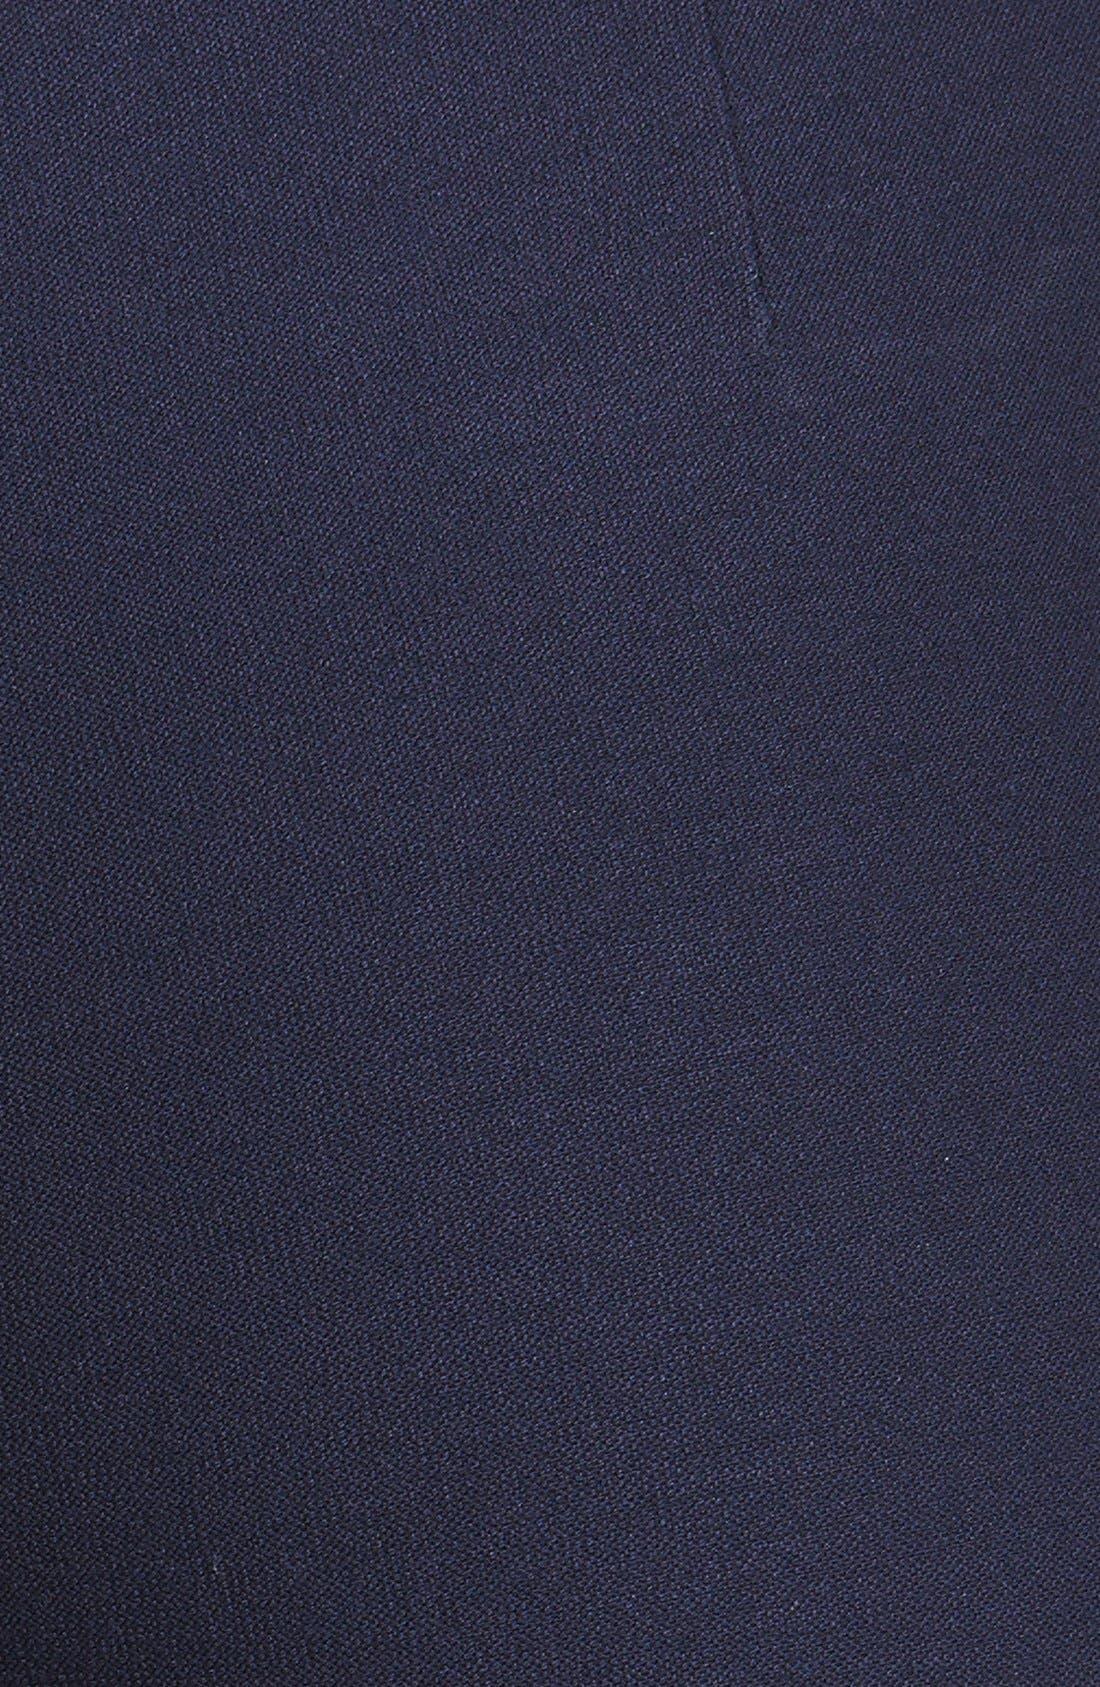 Stretch Crepe Ankle Pants,                             Alternate thumbnail 30, color,